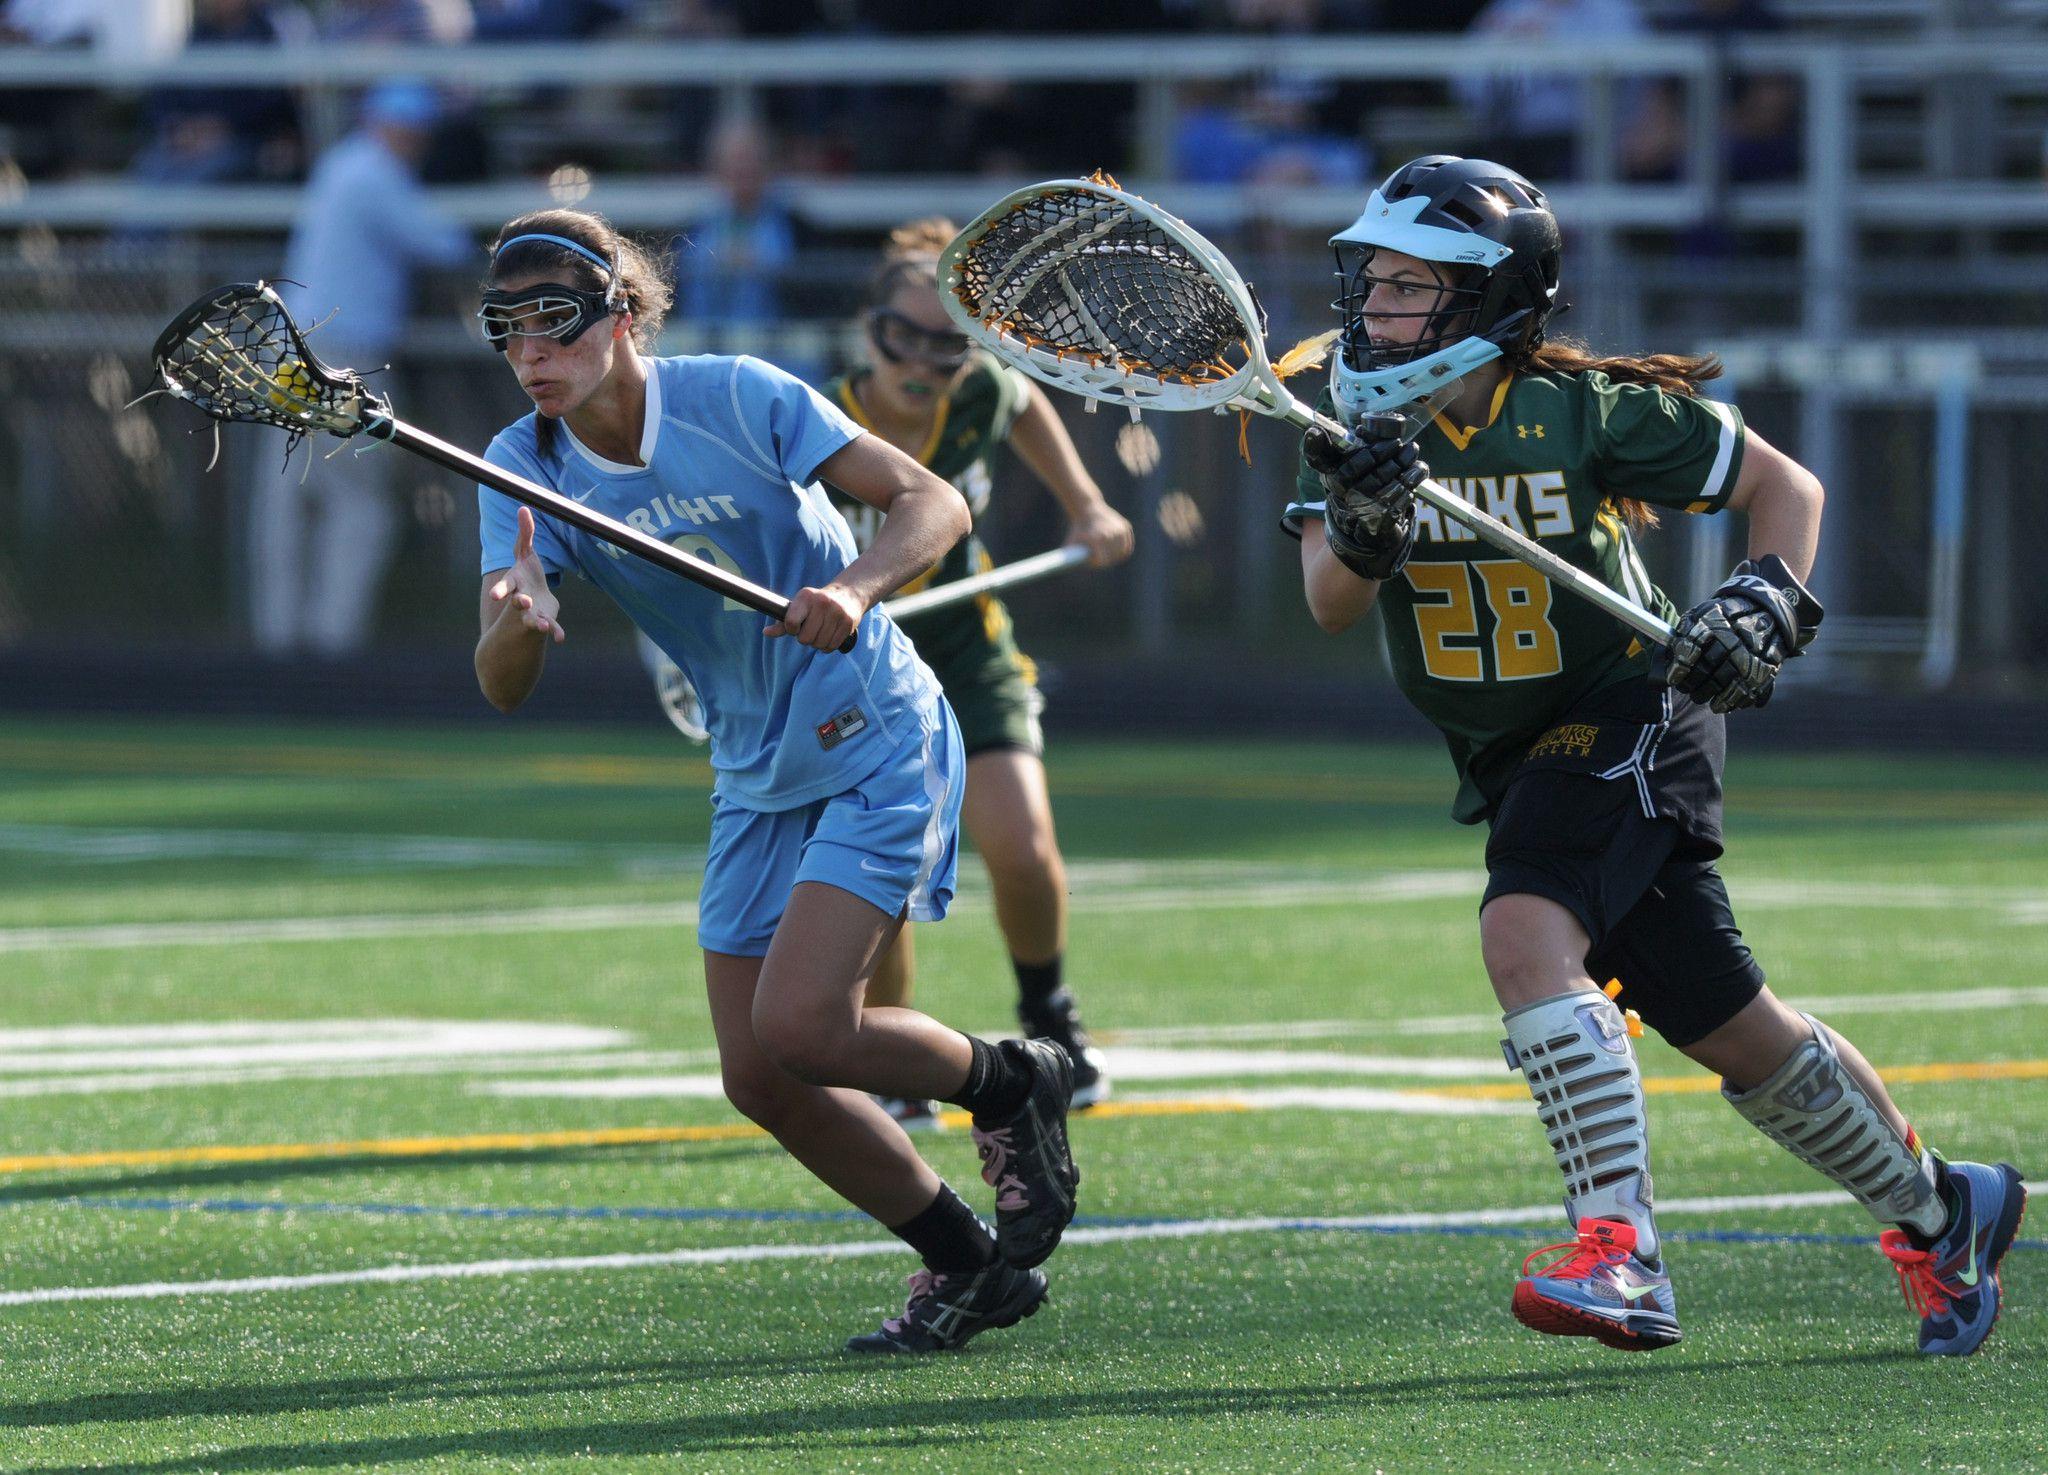 Lacrosse Unlimited FLOWmingos Lacrosse Shorts with deep Side Pockets